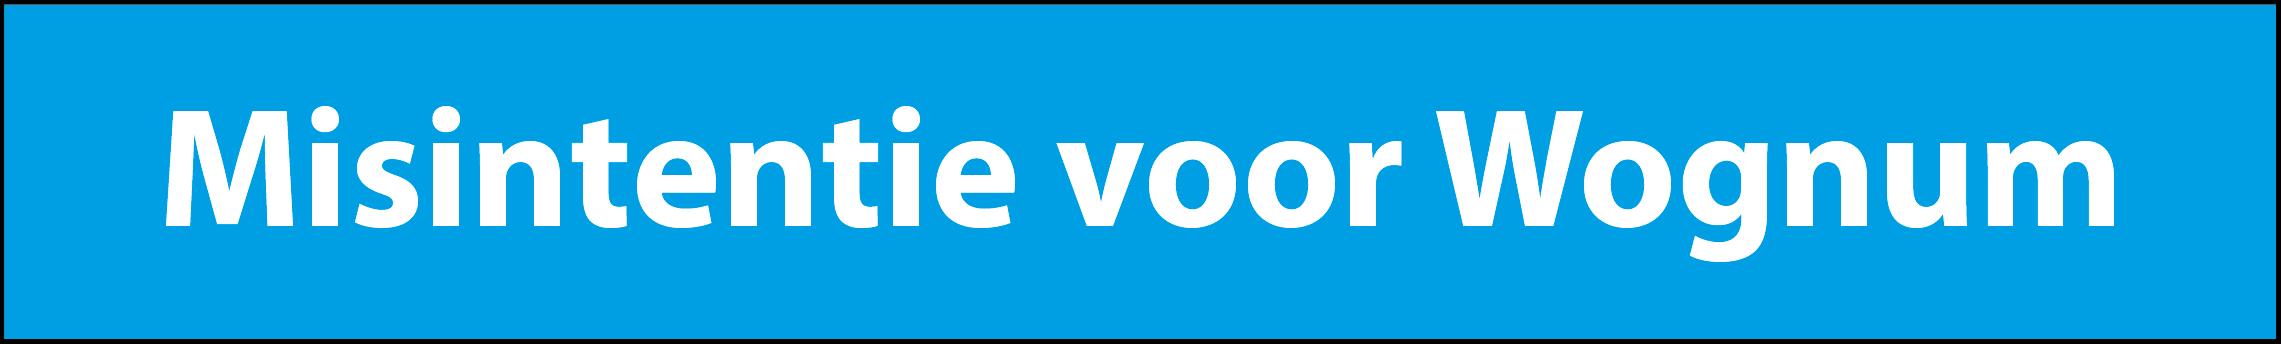 Wognum